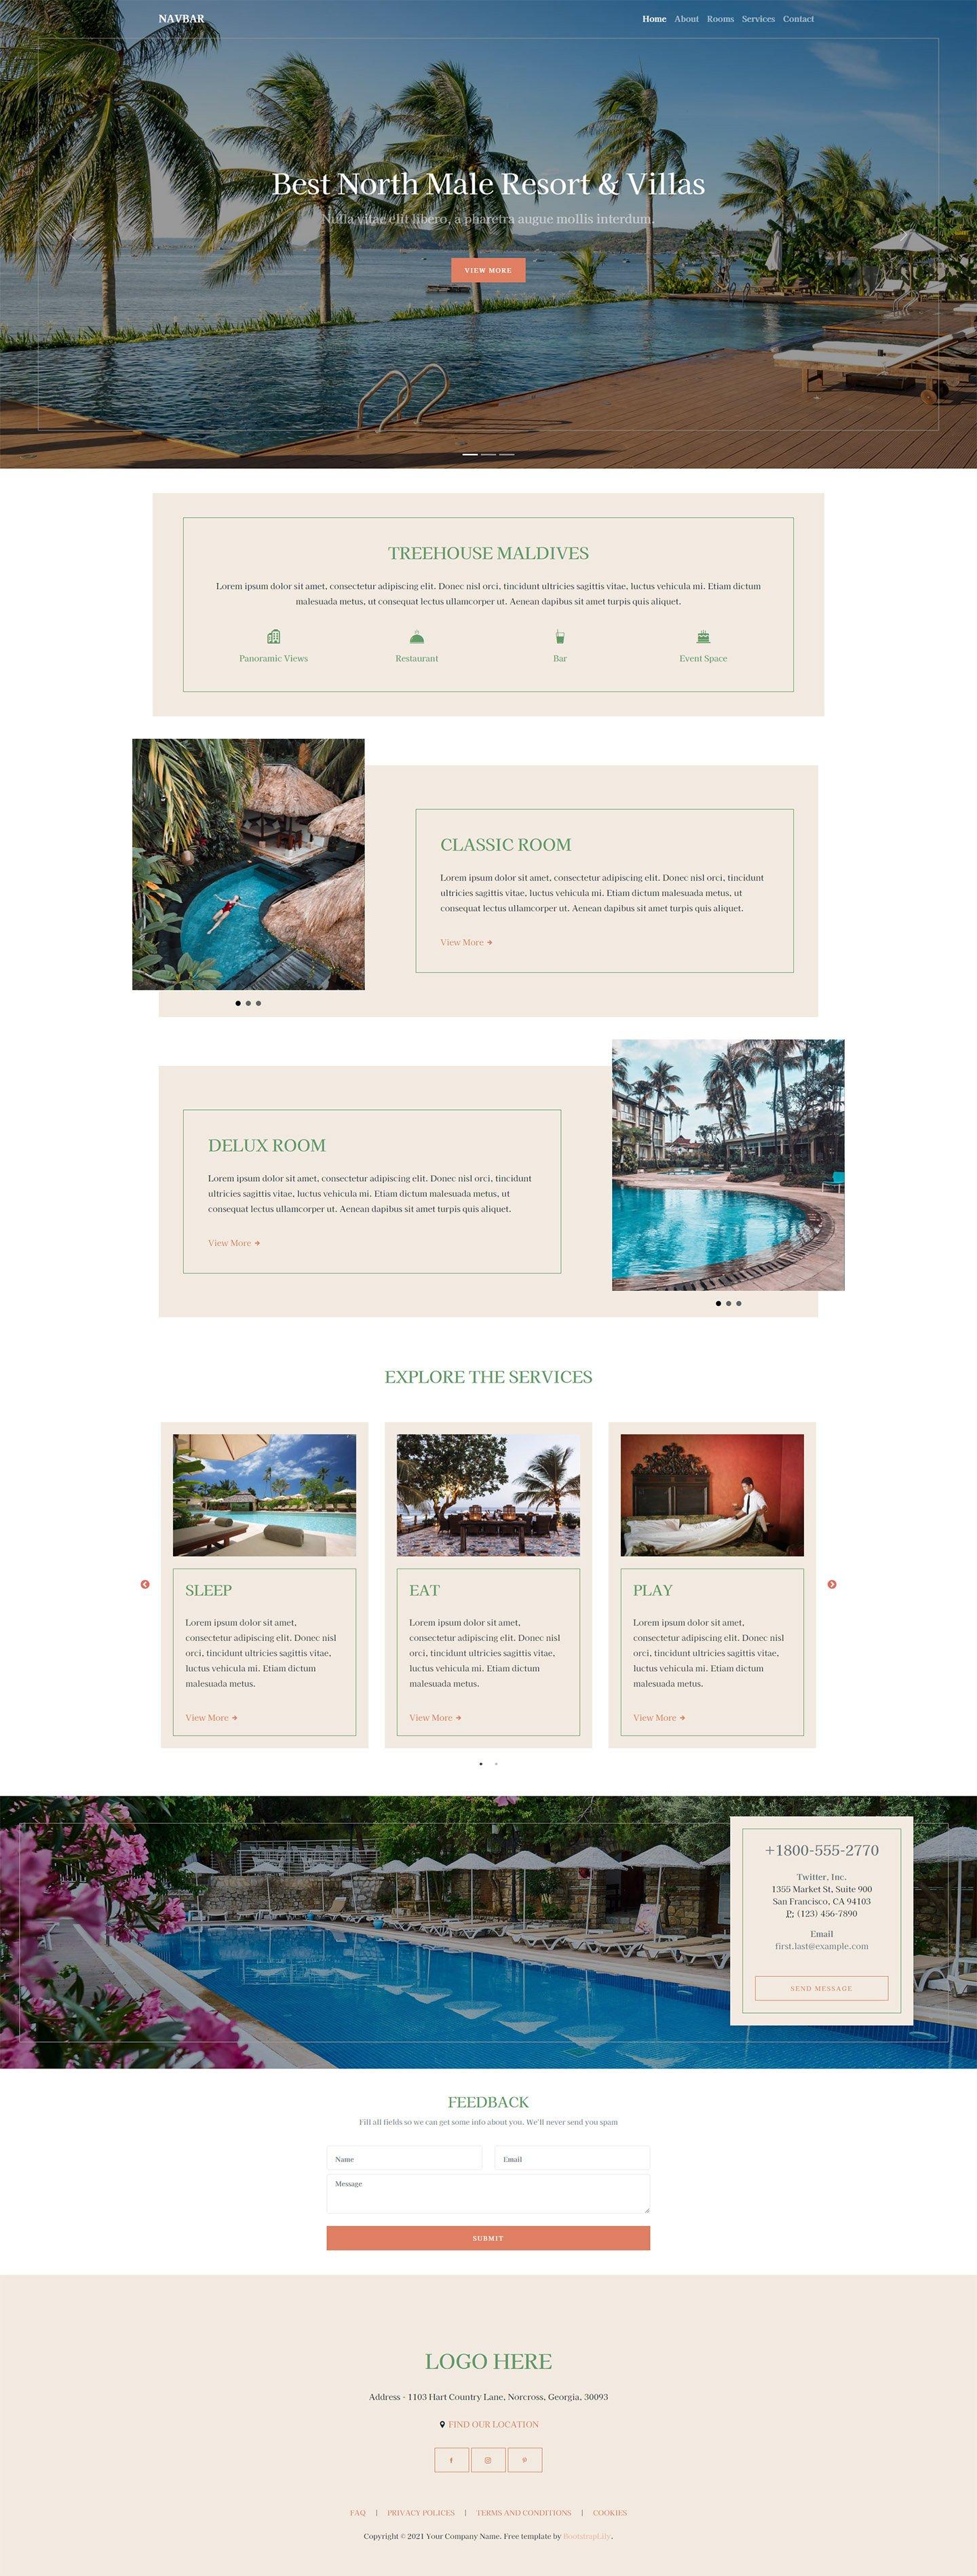 free resort website template